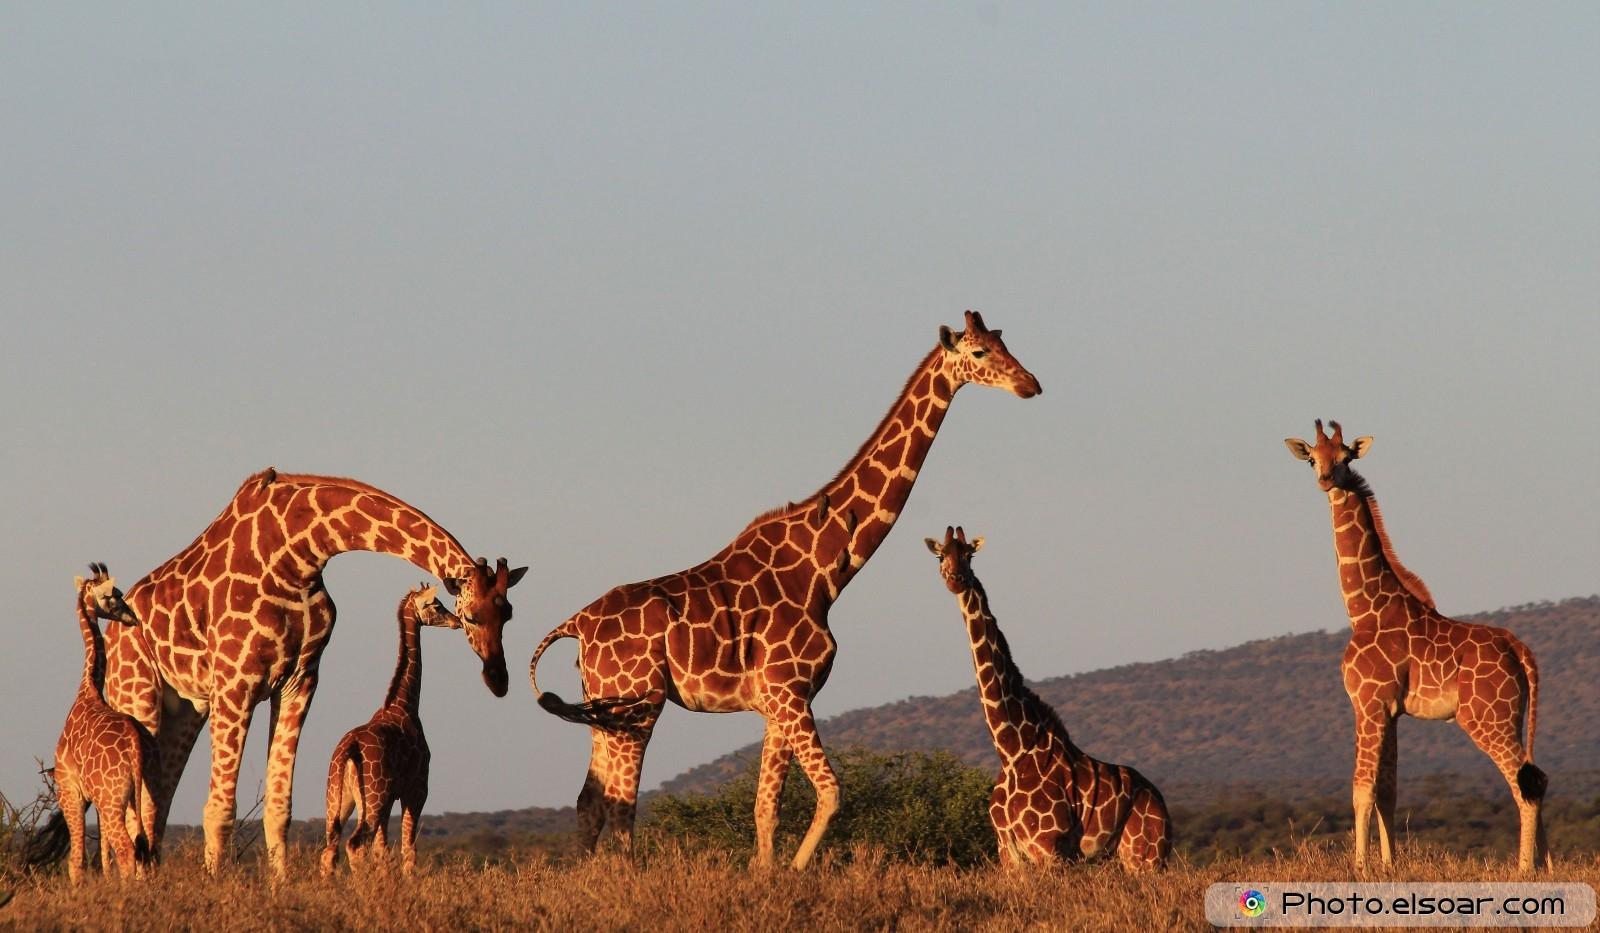 25 most beautiful giraffes pictures u2022 elsoar